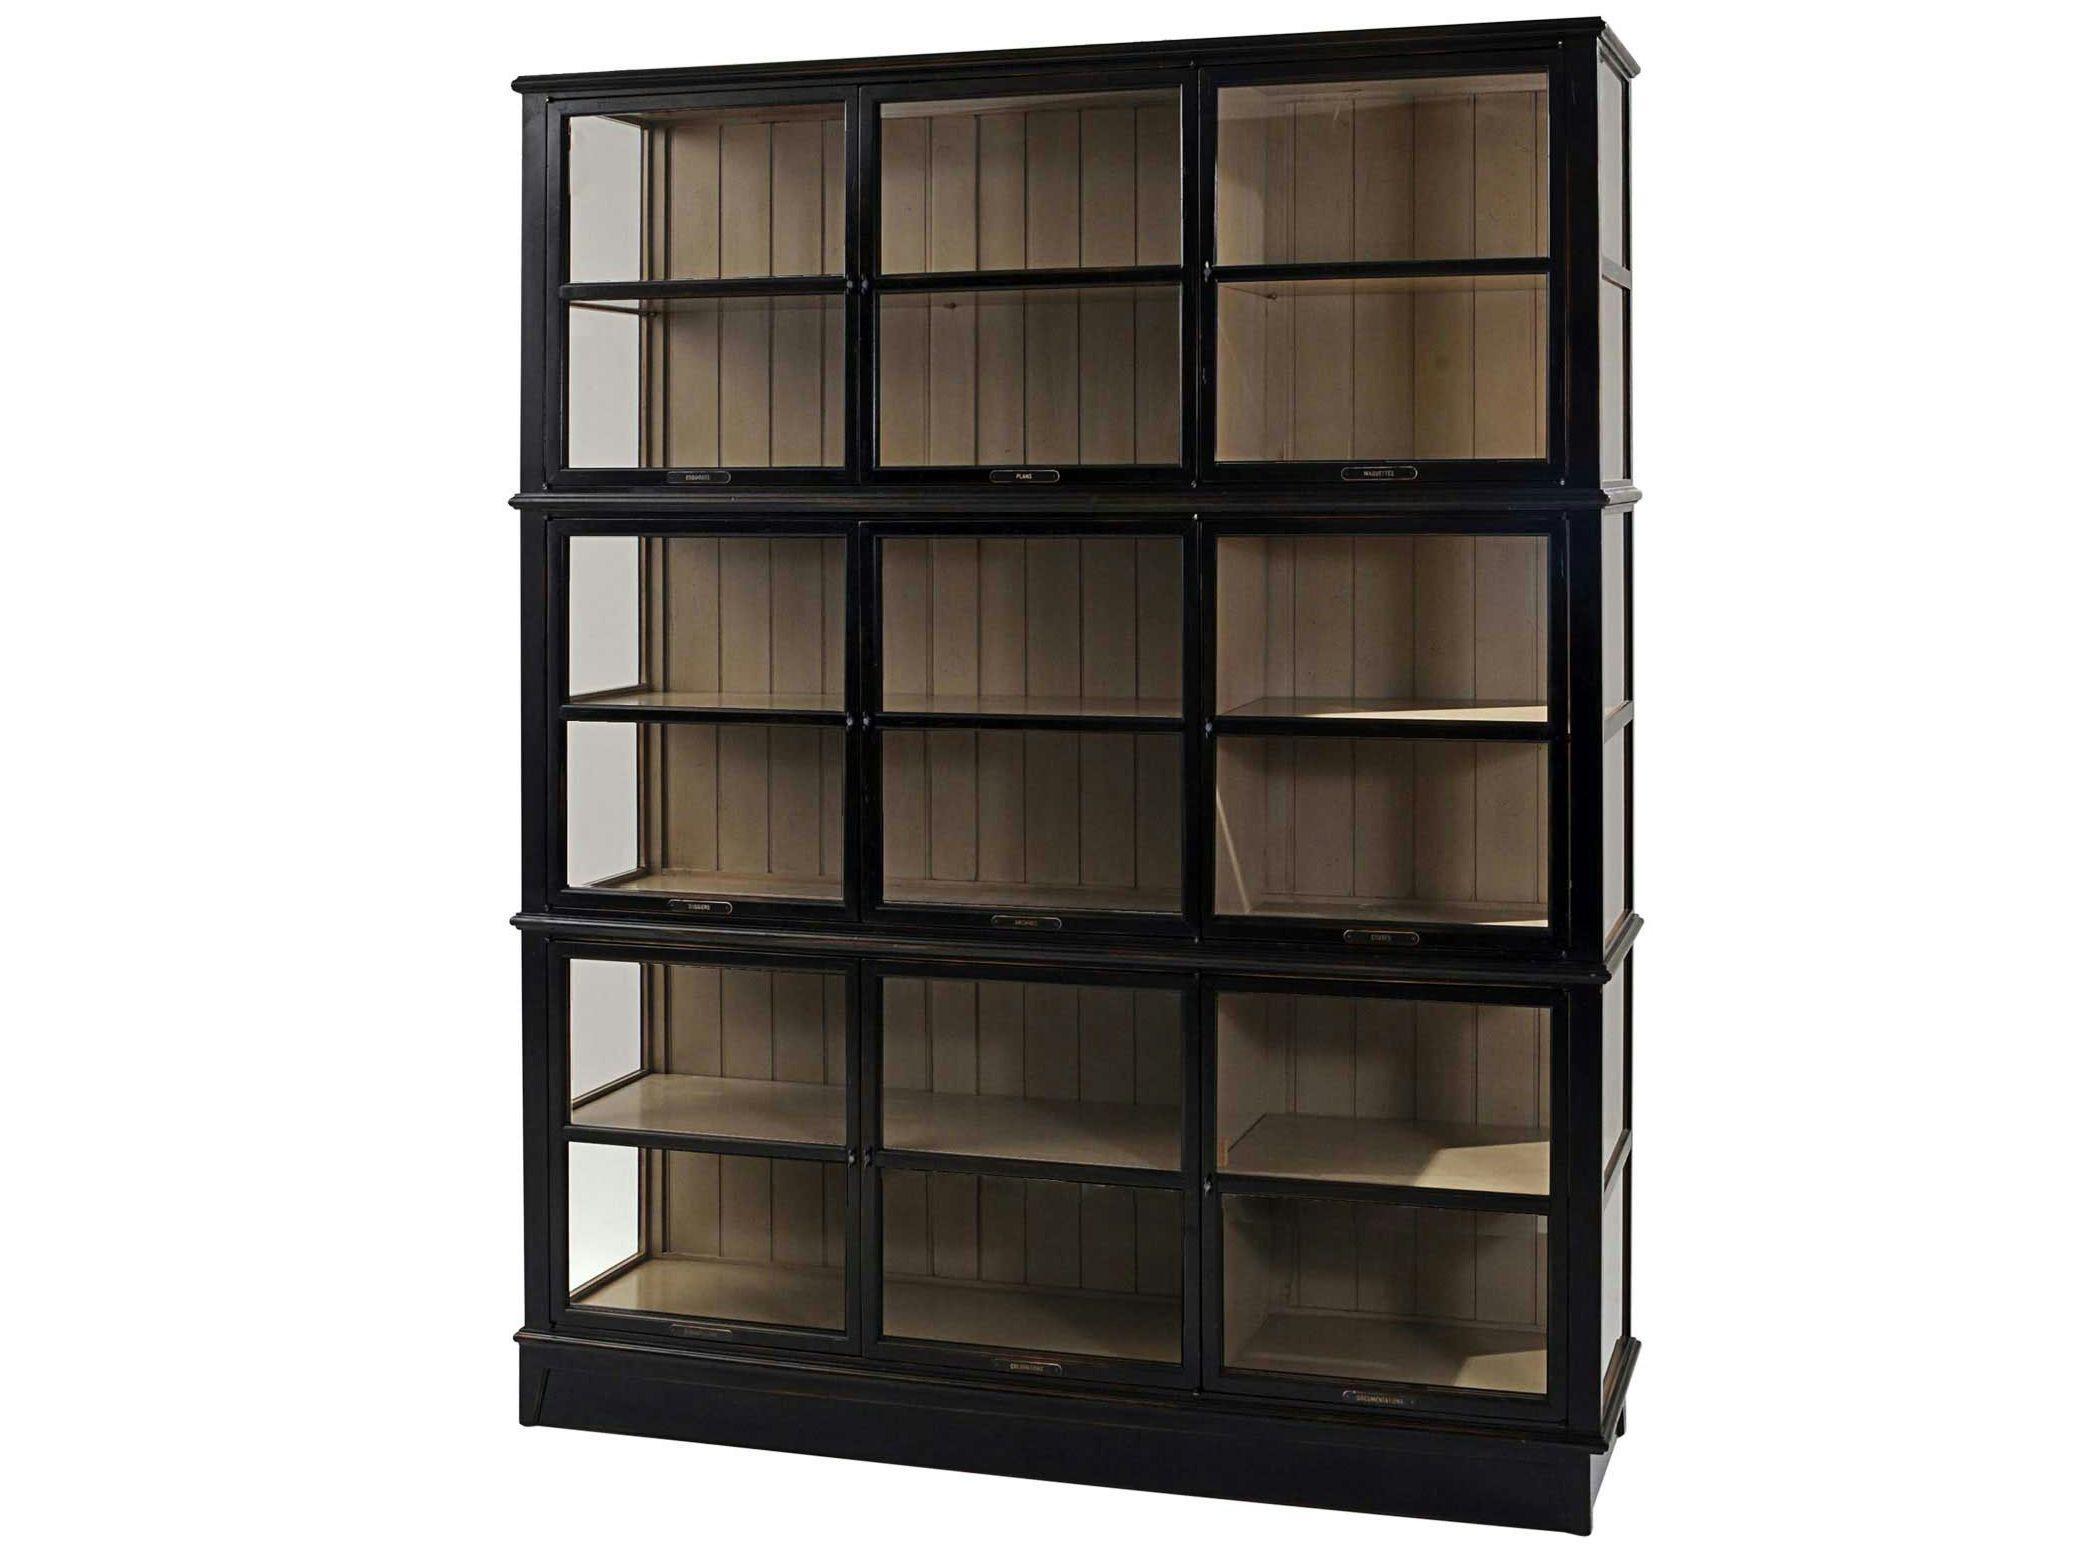 architecte cherry wood display cabinet by roche bobois [ 2084 x 1563 Pixel ]